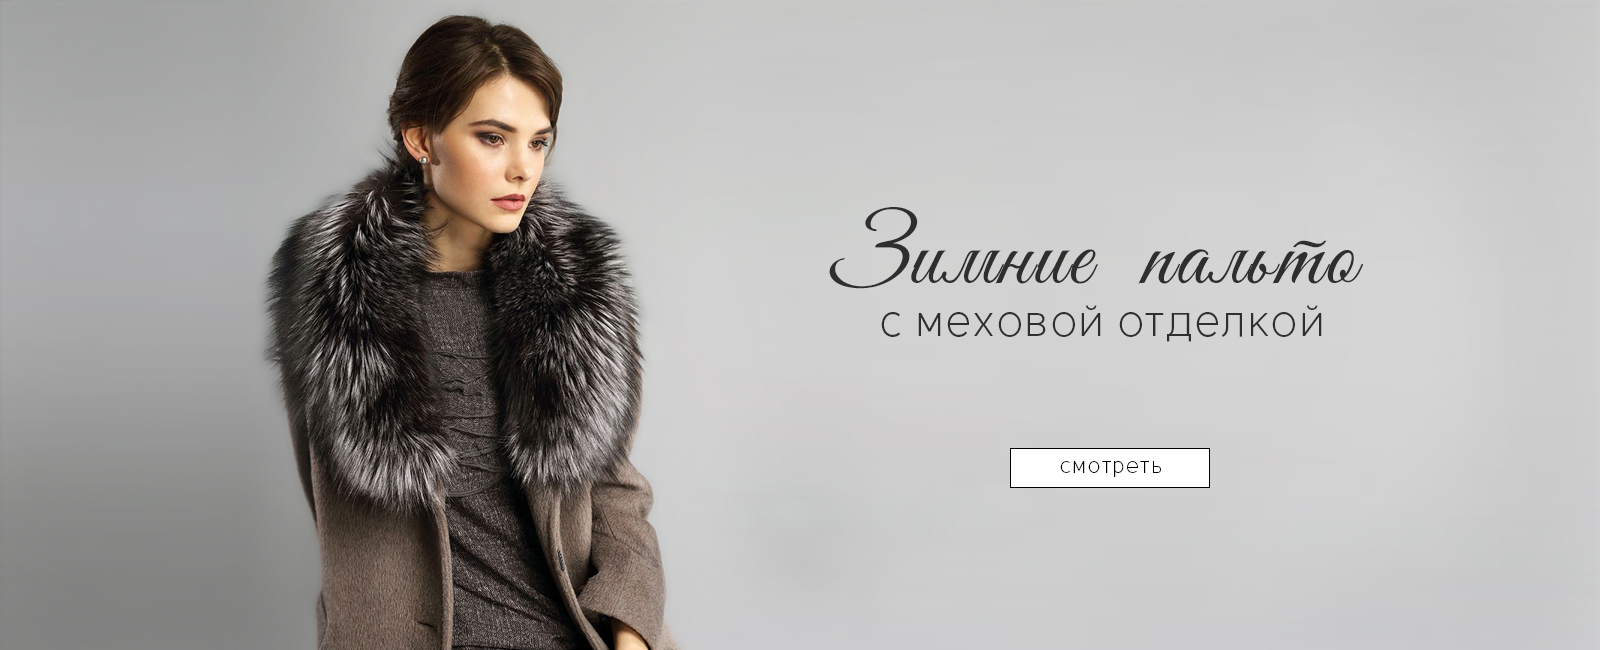 Каталог женской одежды Anna Verdi  интернетмагазин Gratti